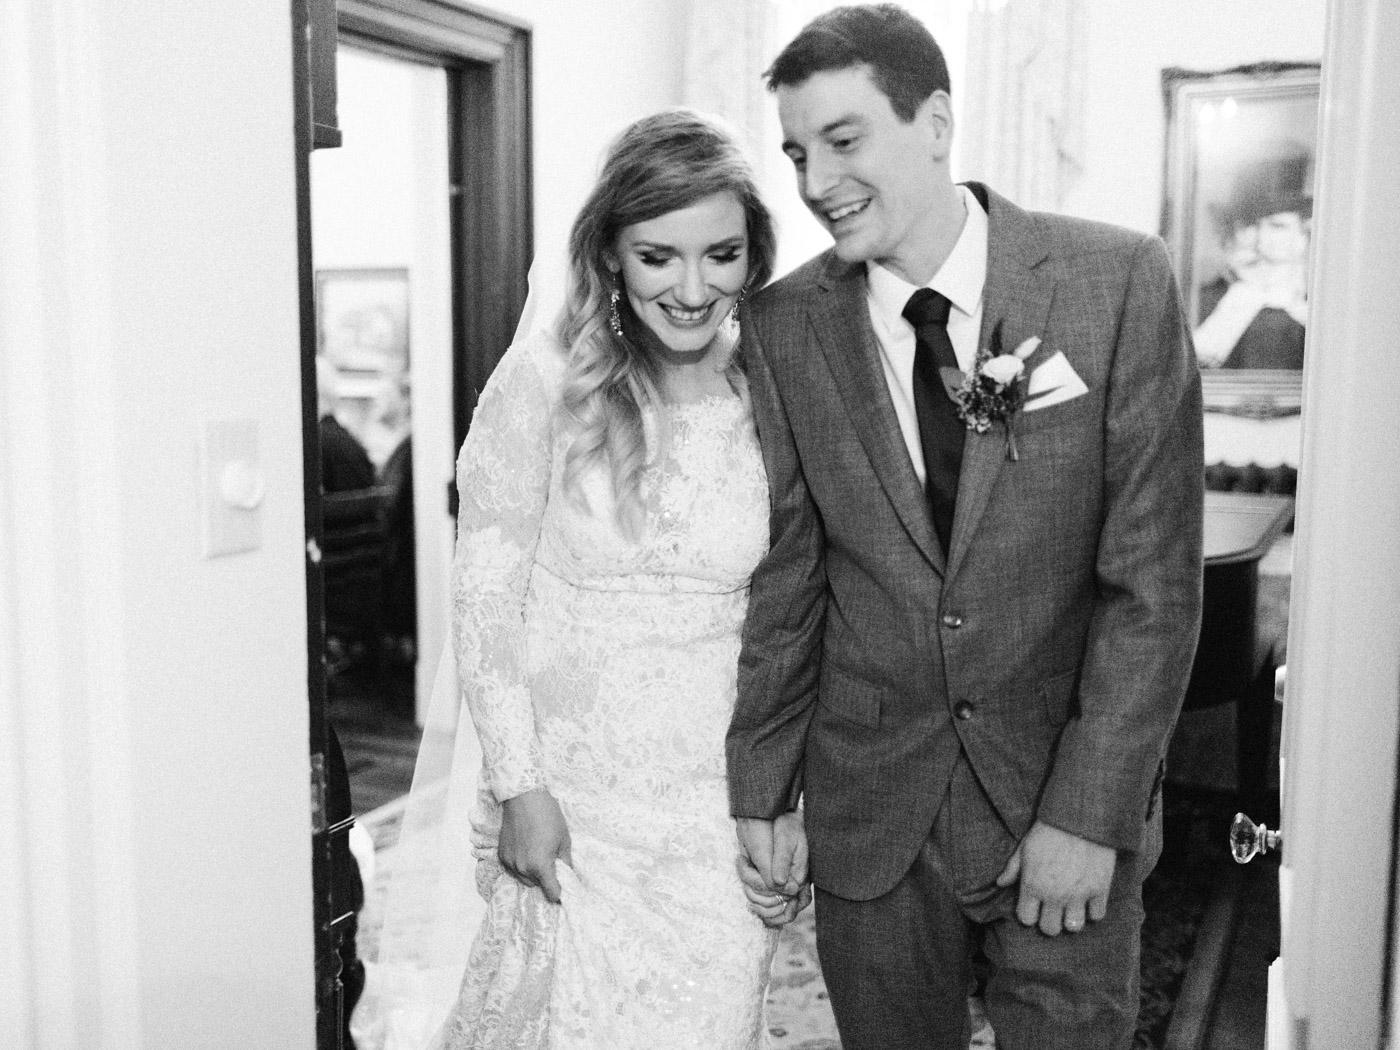 Toronto-wedding-photographer-intimate-classic-fine-art-elopement-ottawa35.jpg